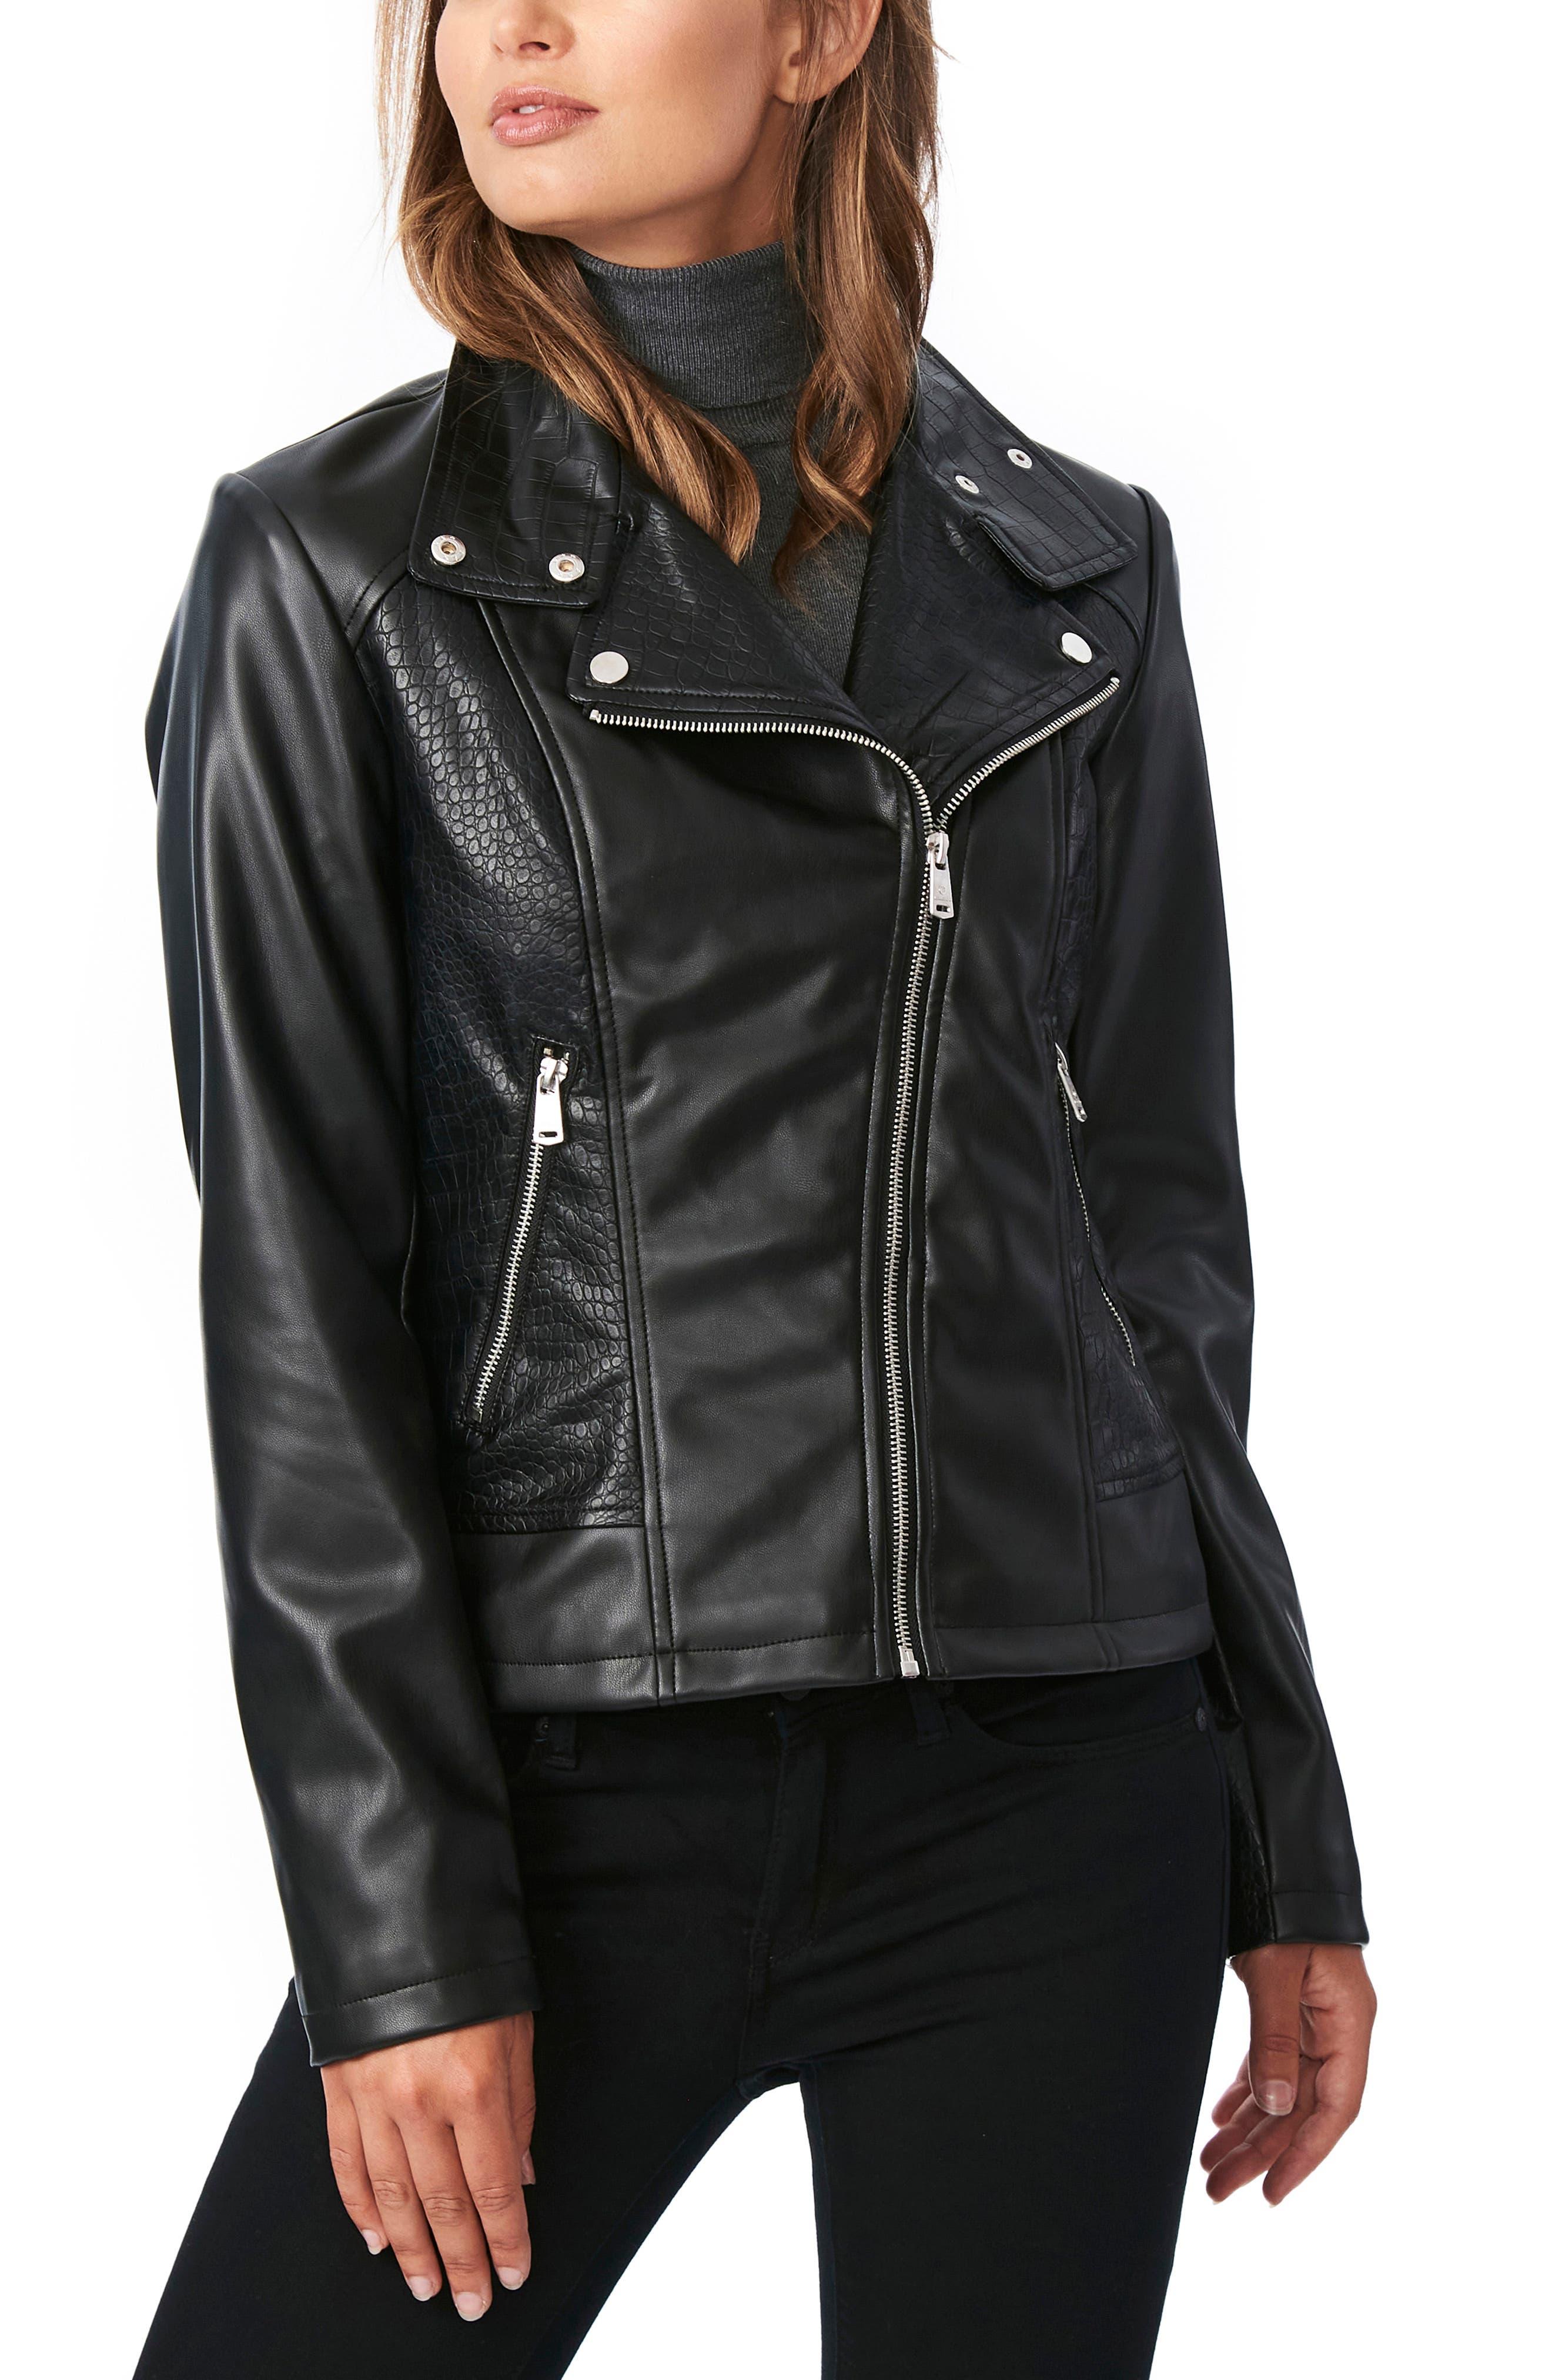 80s Windbreakers, Jackets, Coats Womens Bernardo Croc Embossed Faux Leather Moto Jacket Size XX-Large - Black $89.90 AT vintagedancer.com